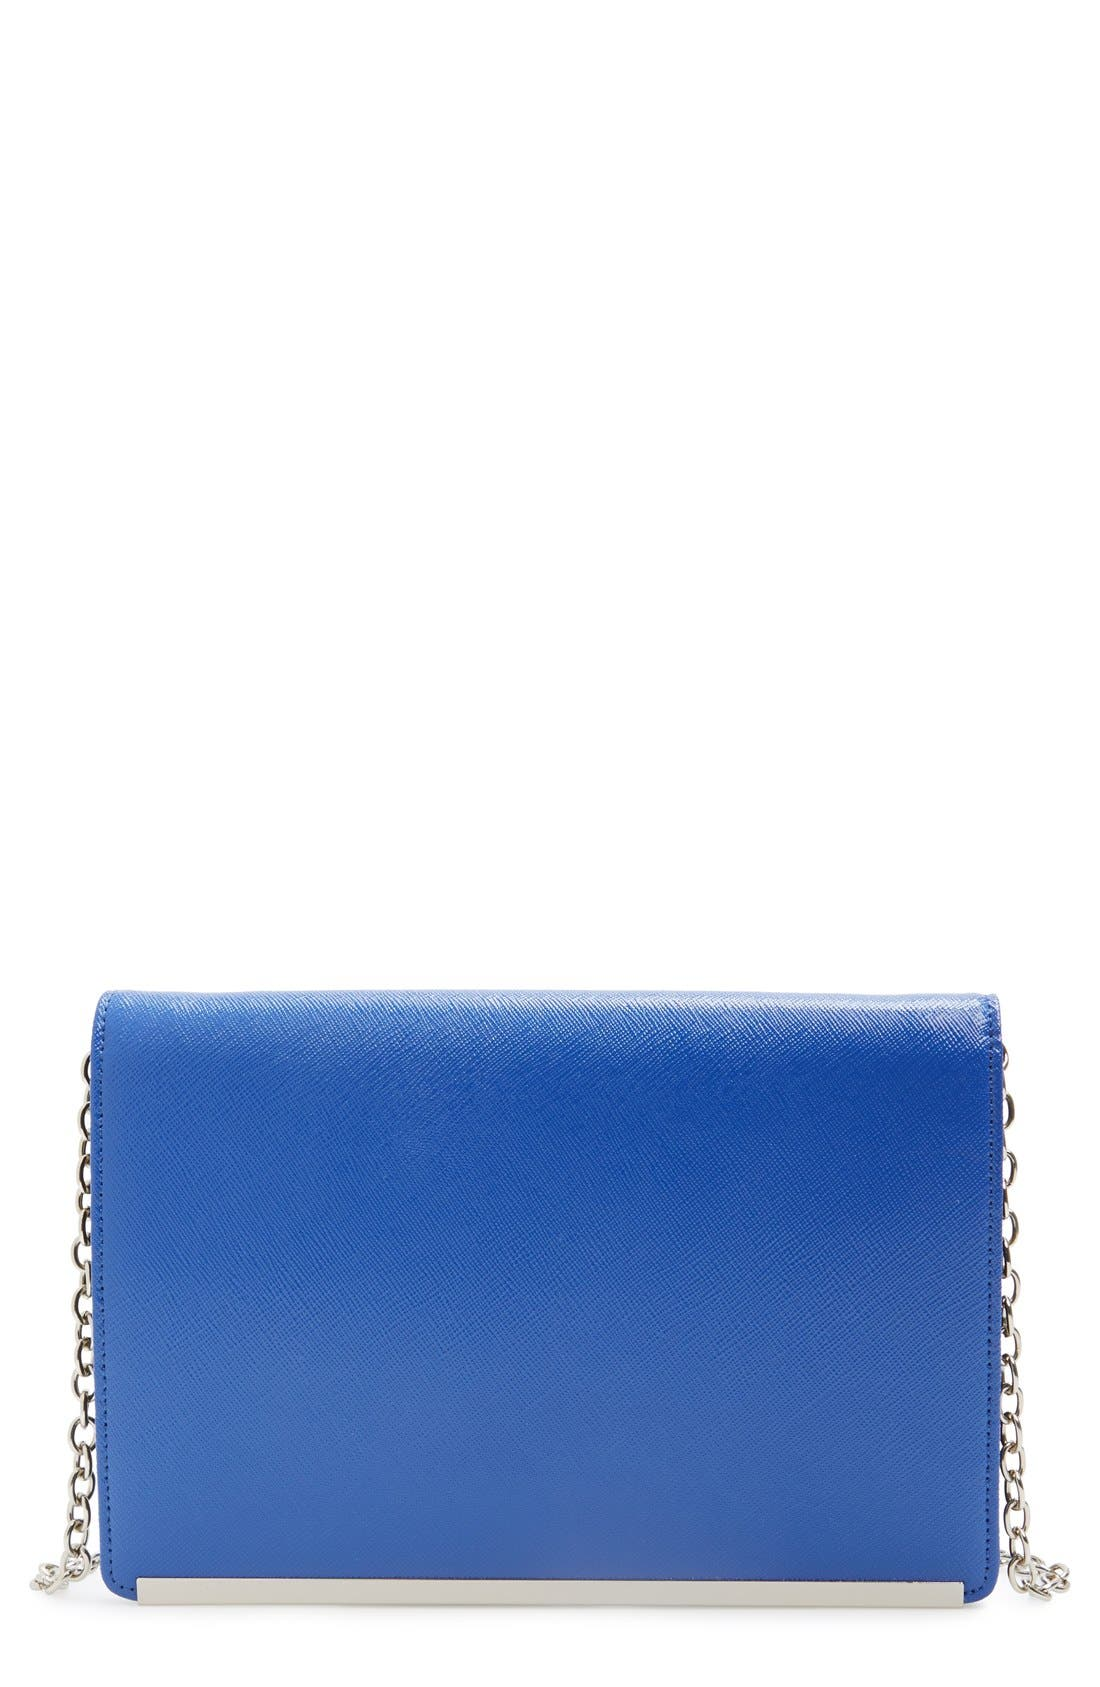 Alternate Image 1 Selected - Halogen® Crossbody Clutch Wallet